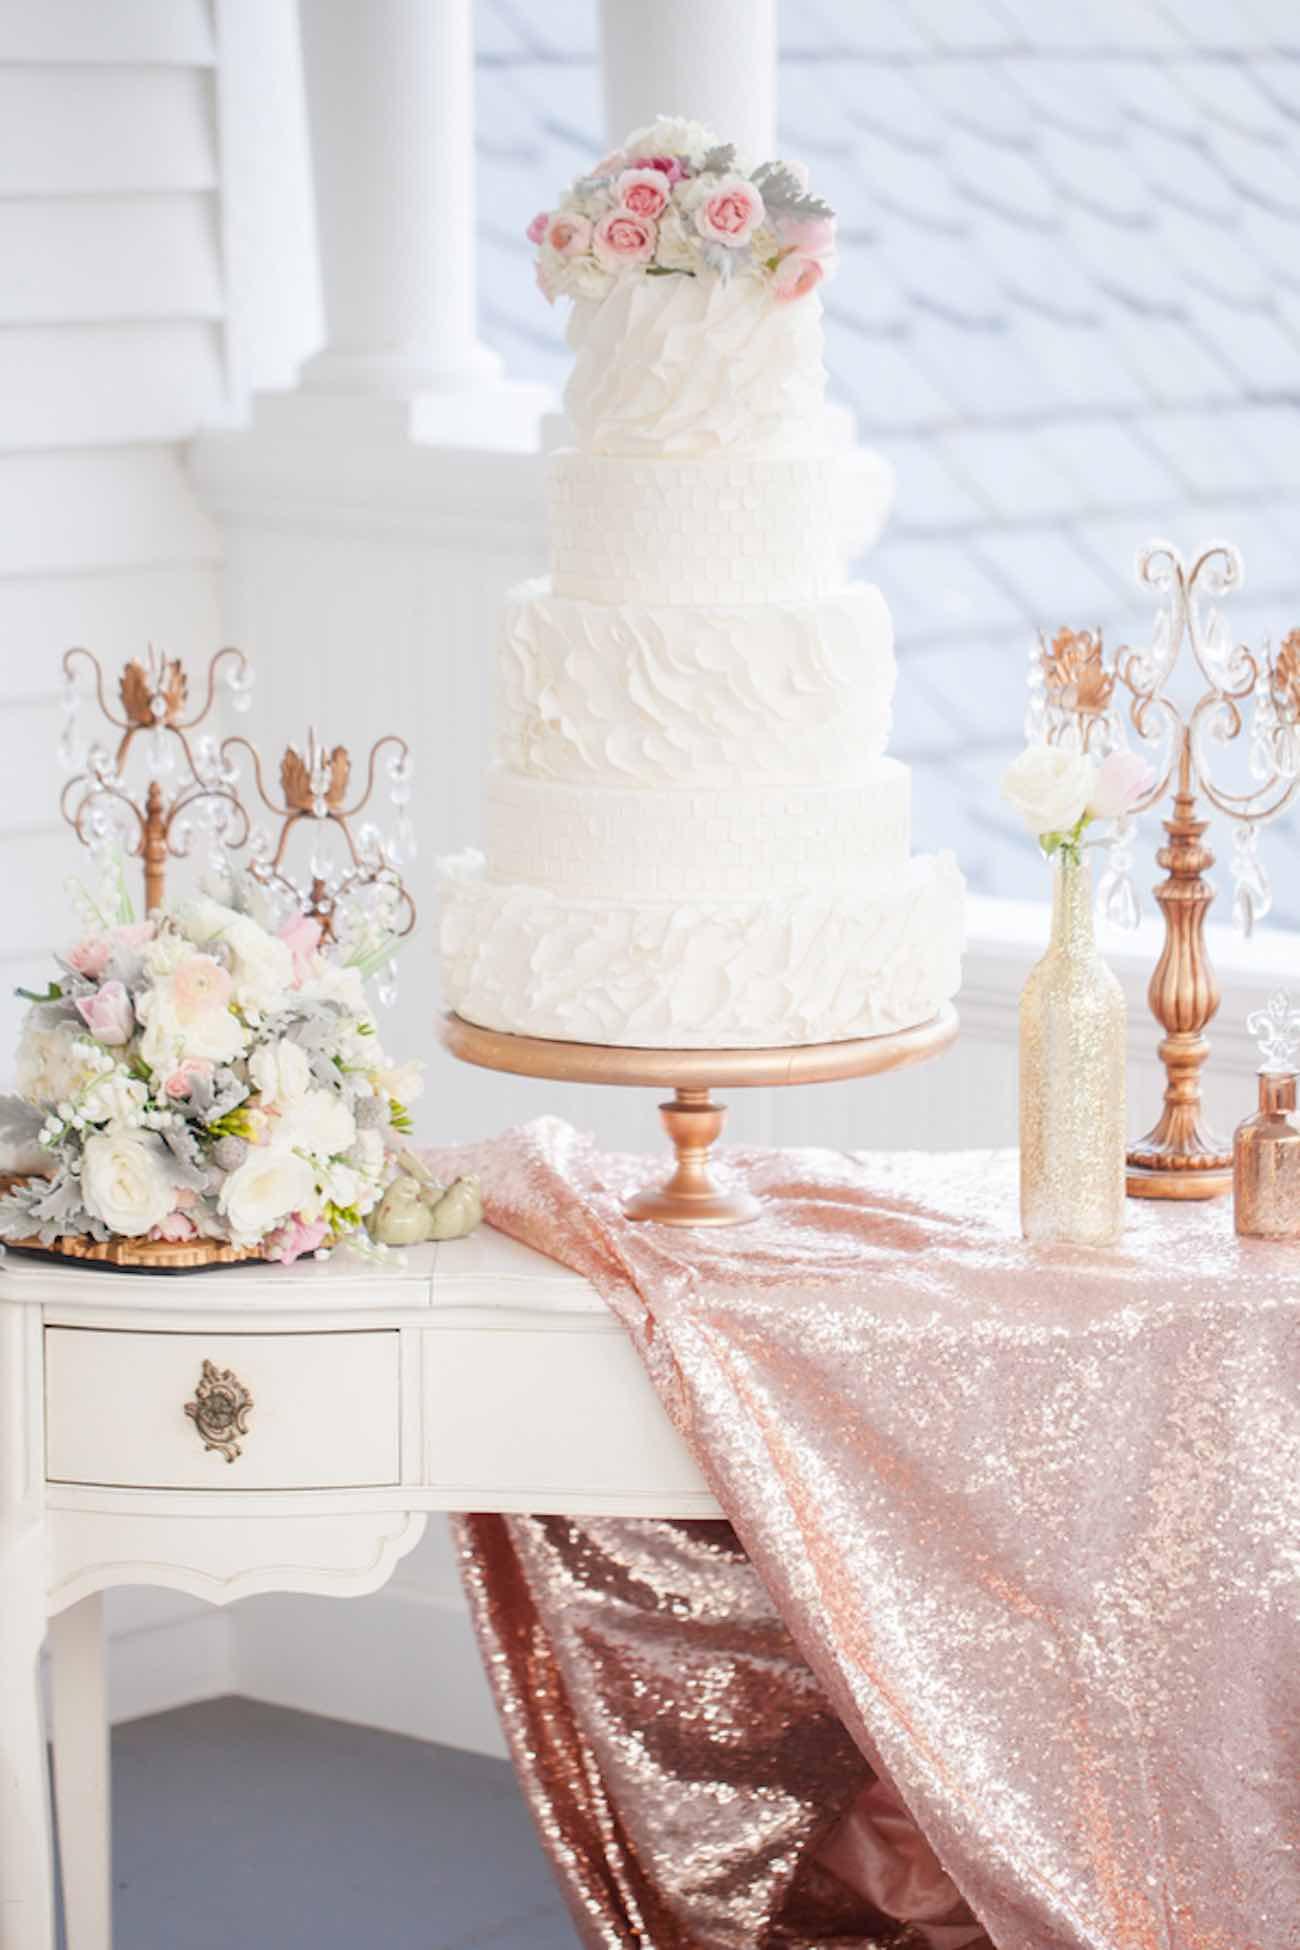 Enchanting Ivory And Gold Wedding Decorations Ideas - The Wedding ...